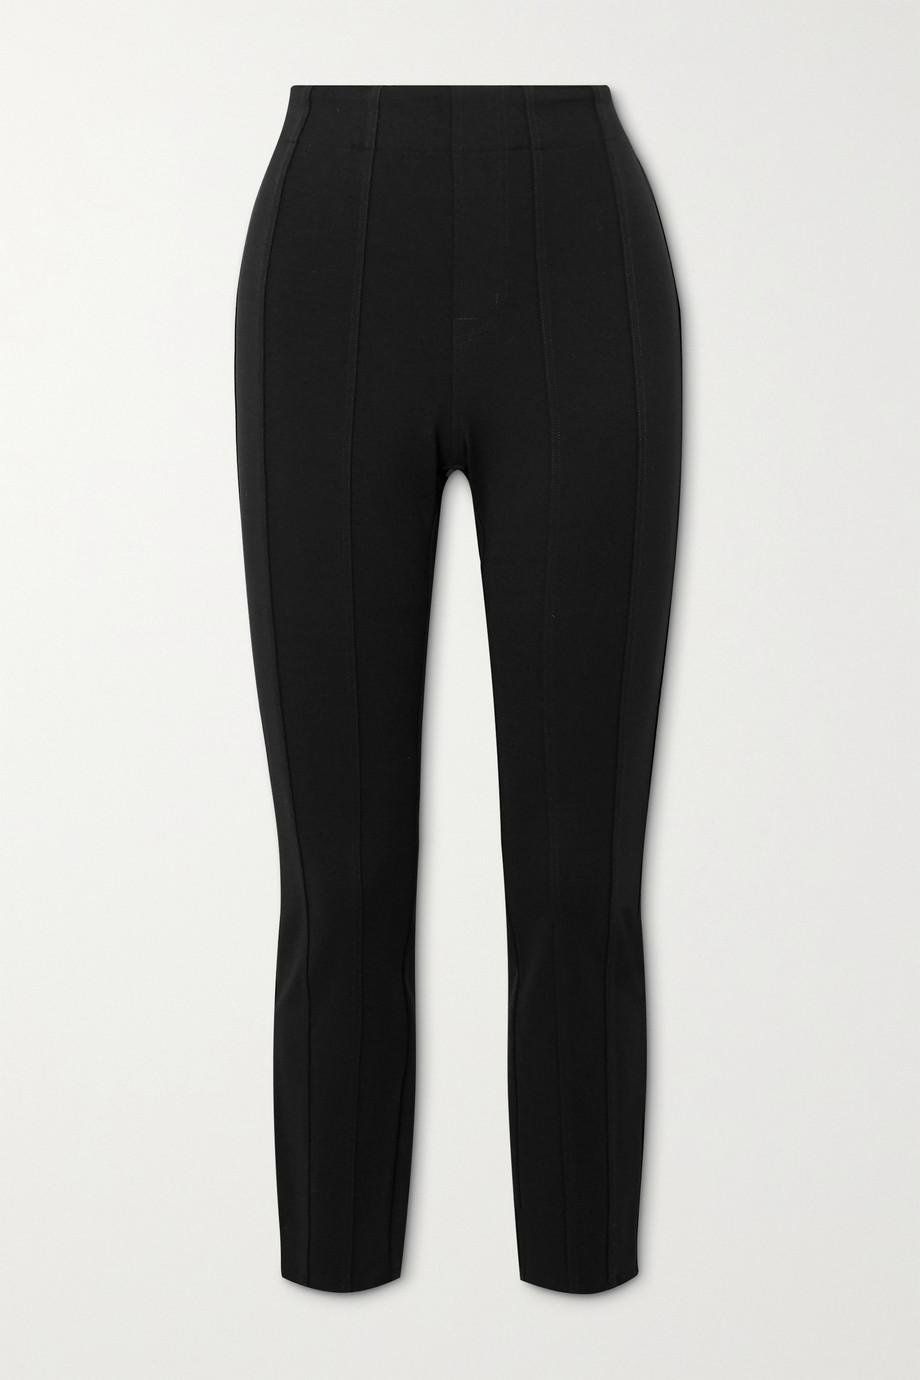 J Brand Dellah stretch-ponte leggings